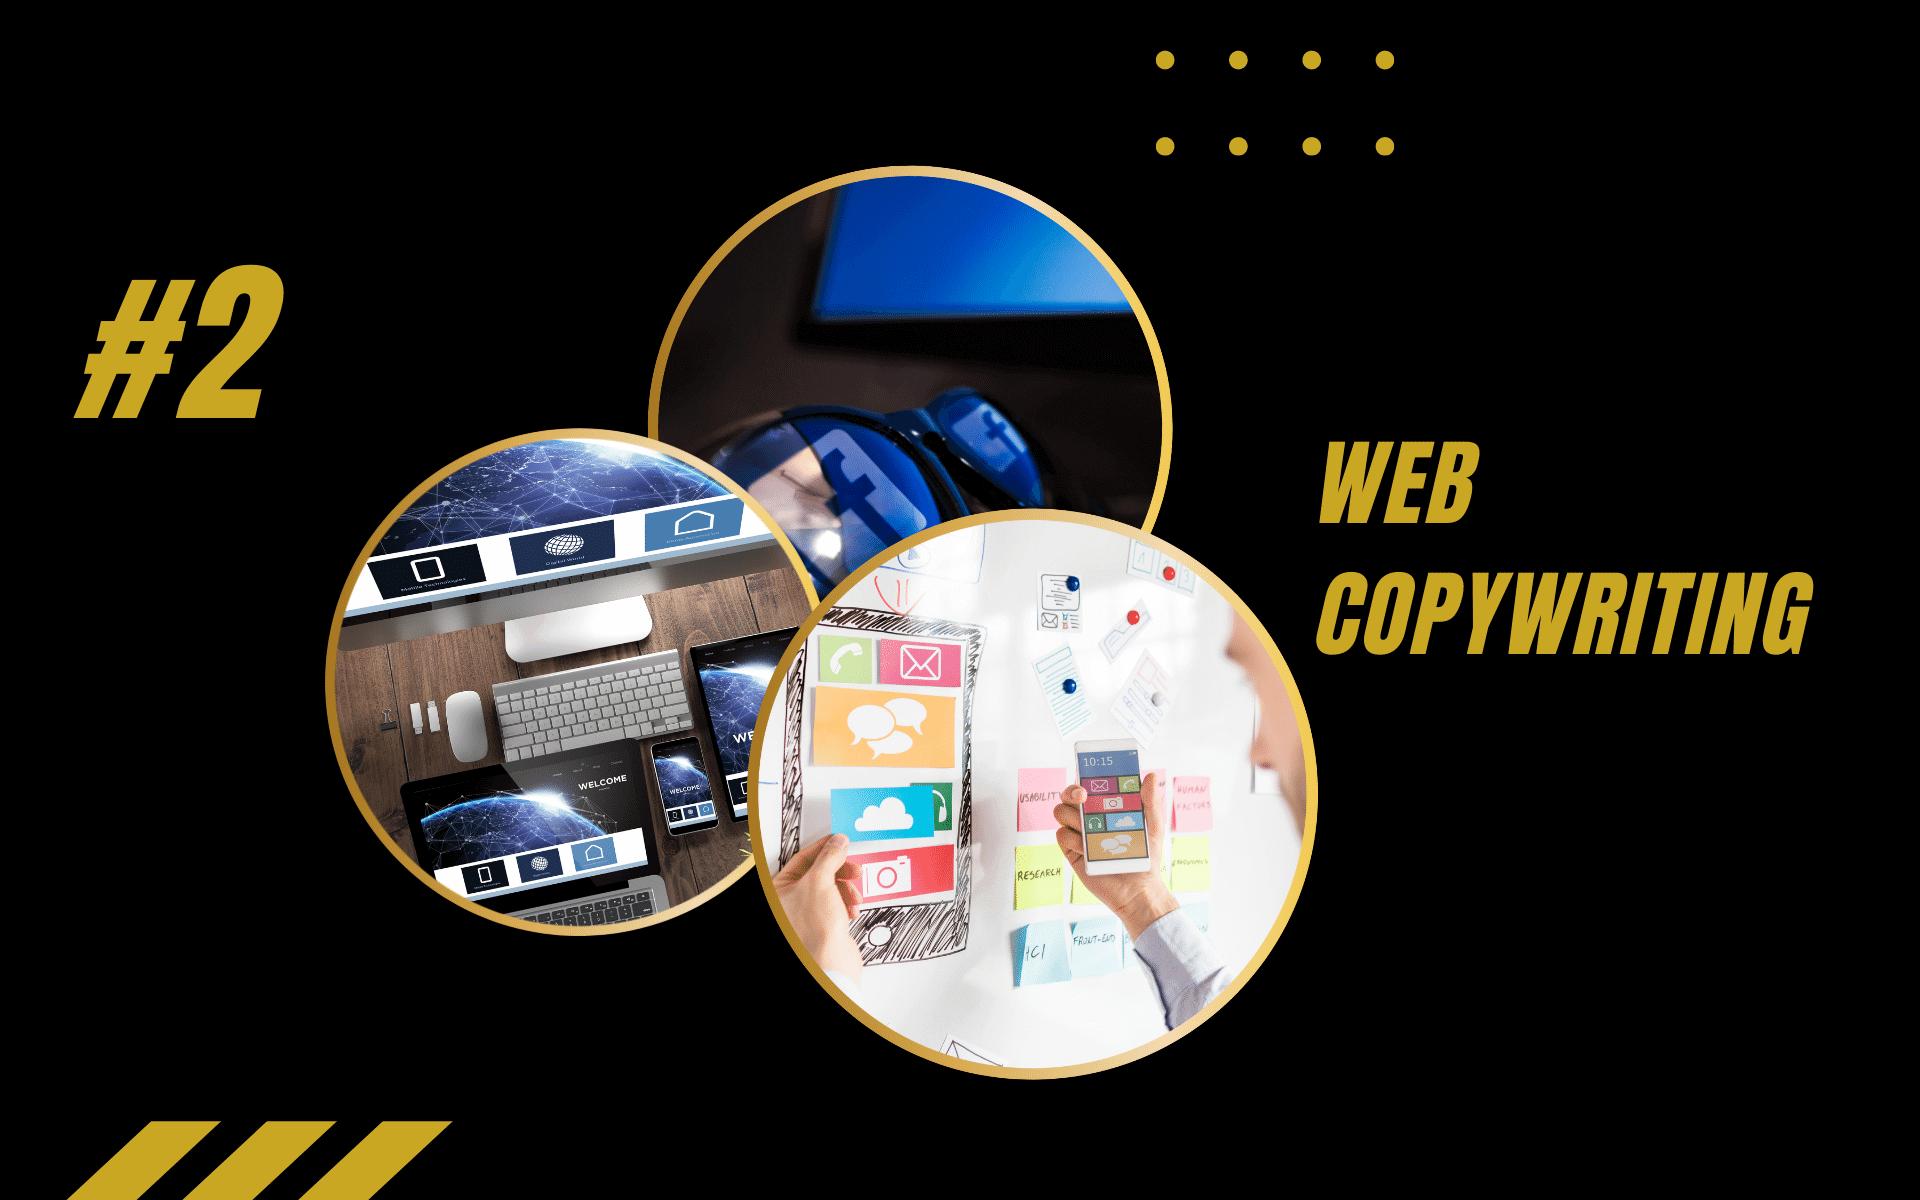 Web Copywriting Content Writing 101